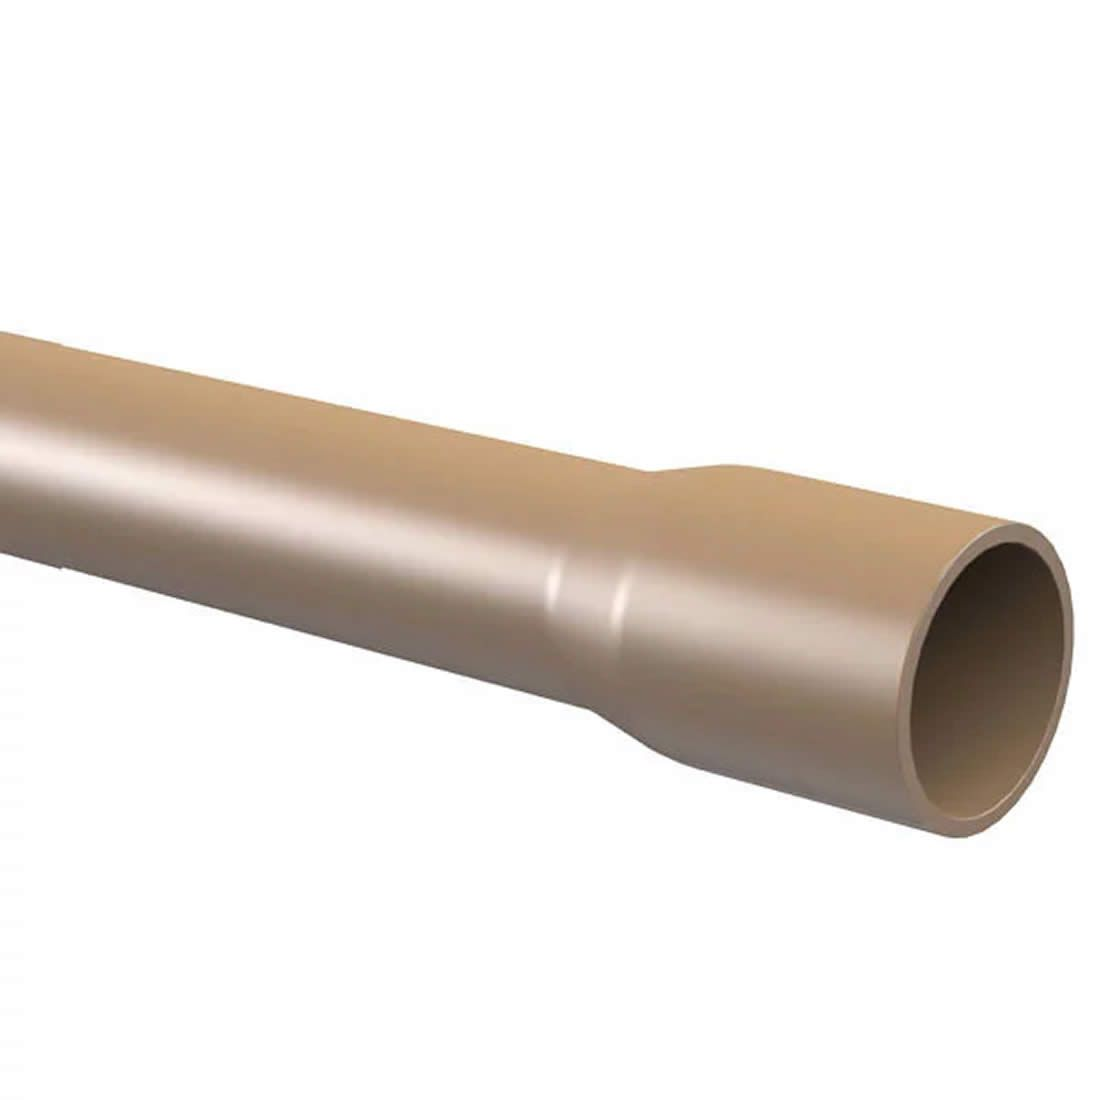 Tubo PVC Soldável 20mm X 6 Metros Tigre